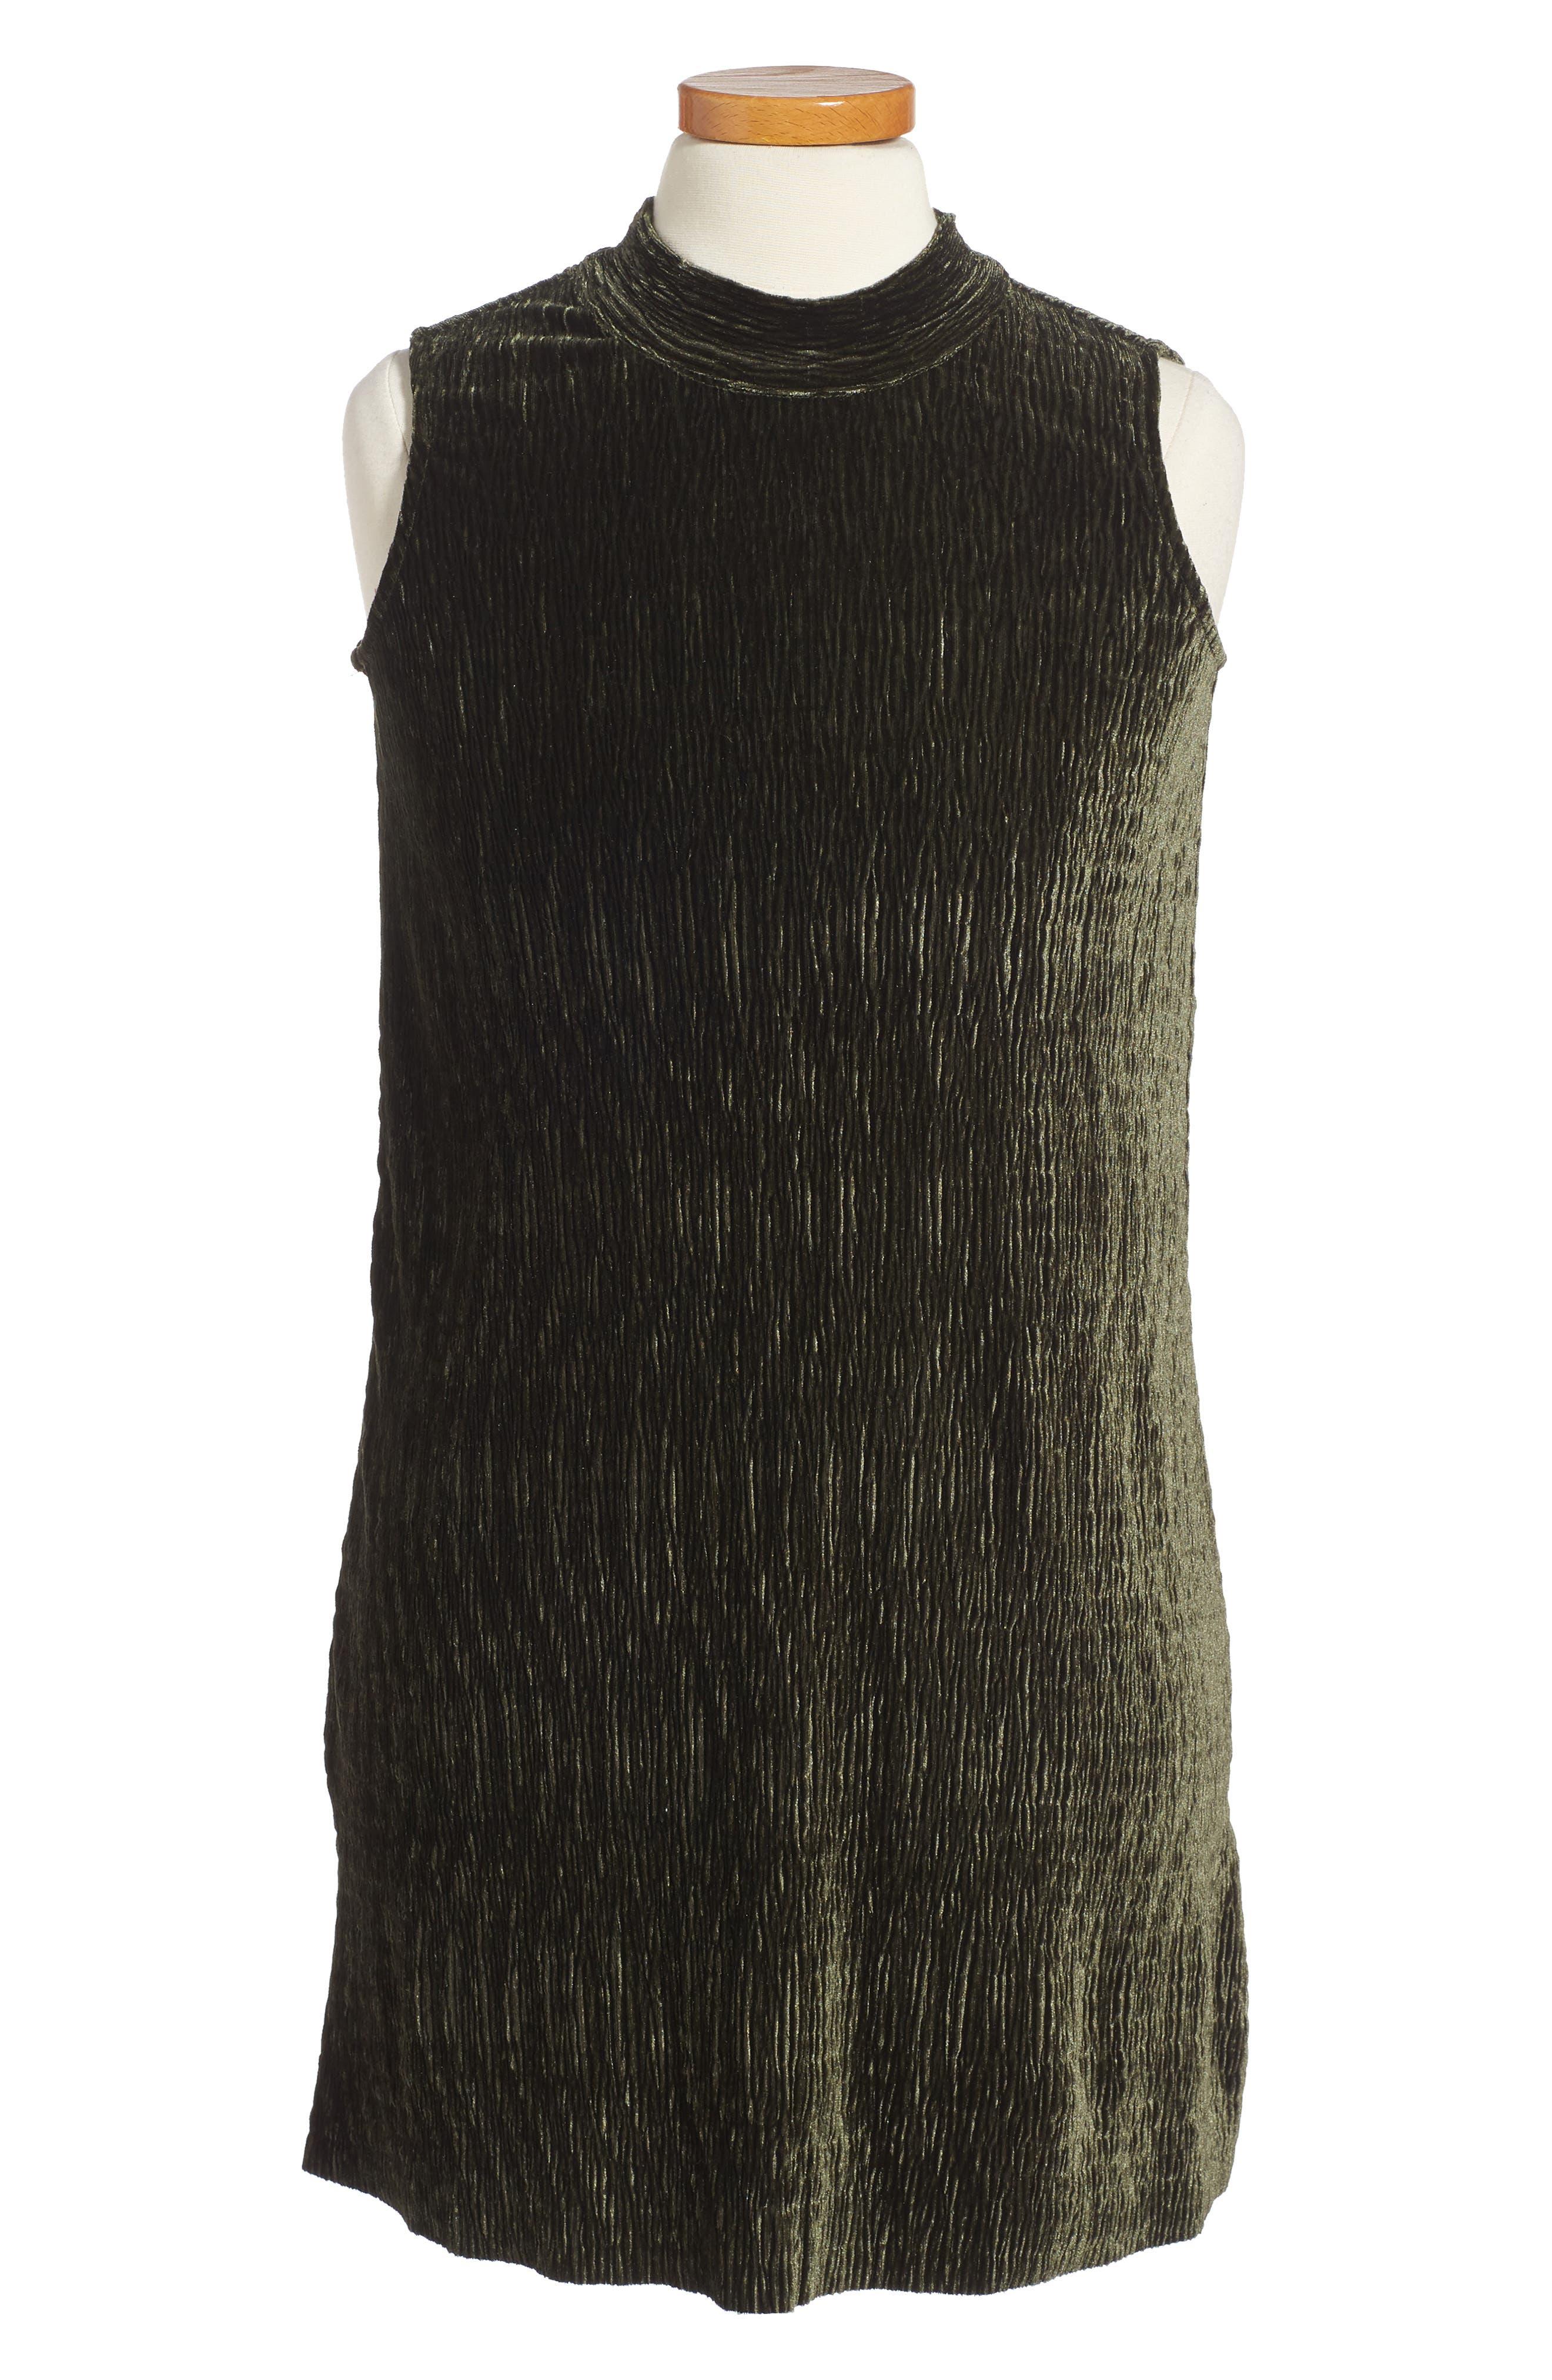 Main Image - For All Seasons Mock Neck Dress (Big Girls)